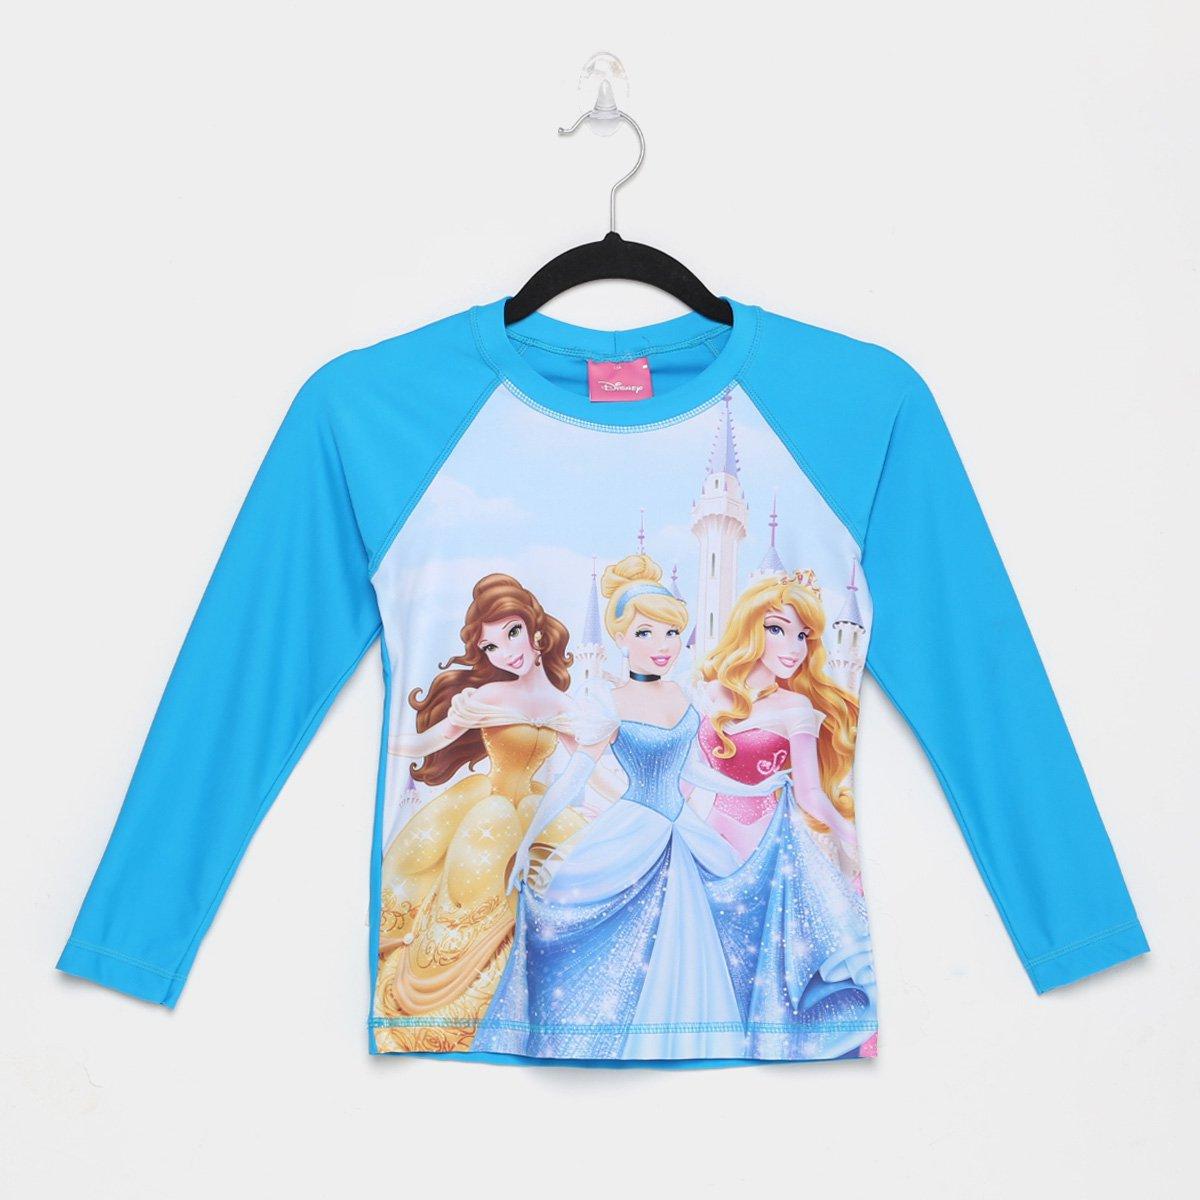 Camiseta De Praia Infantil Tip Top Disney Ml Princesas Feminina